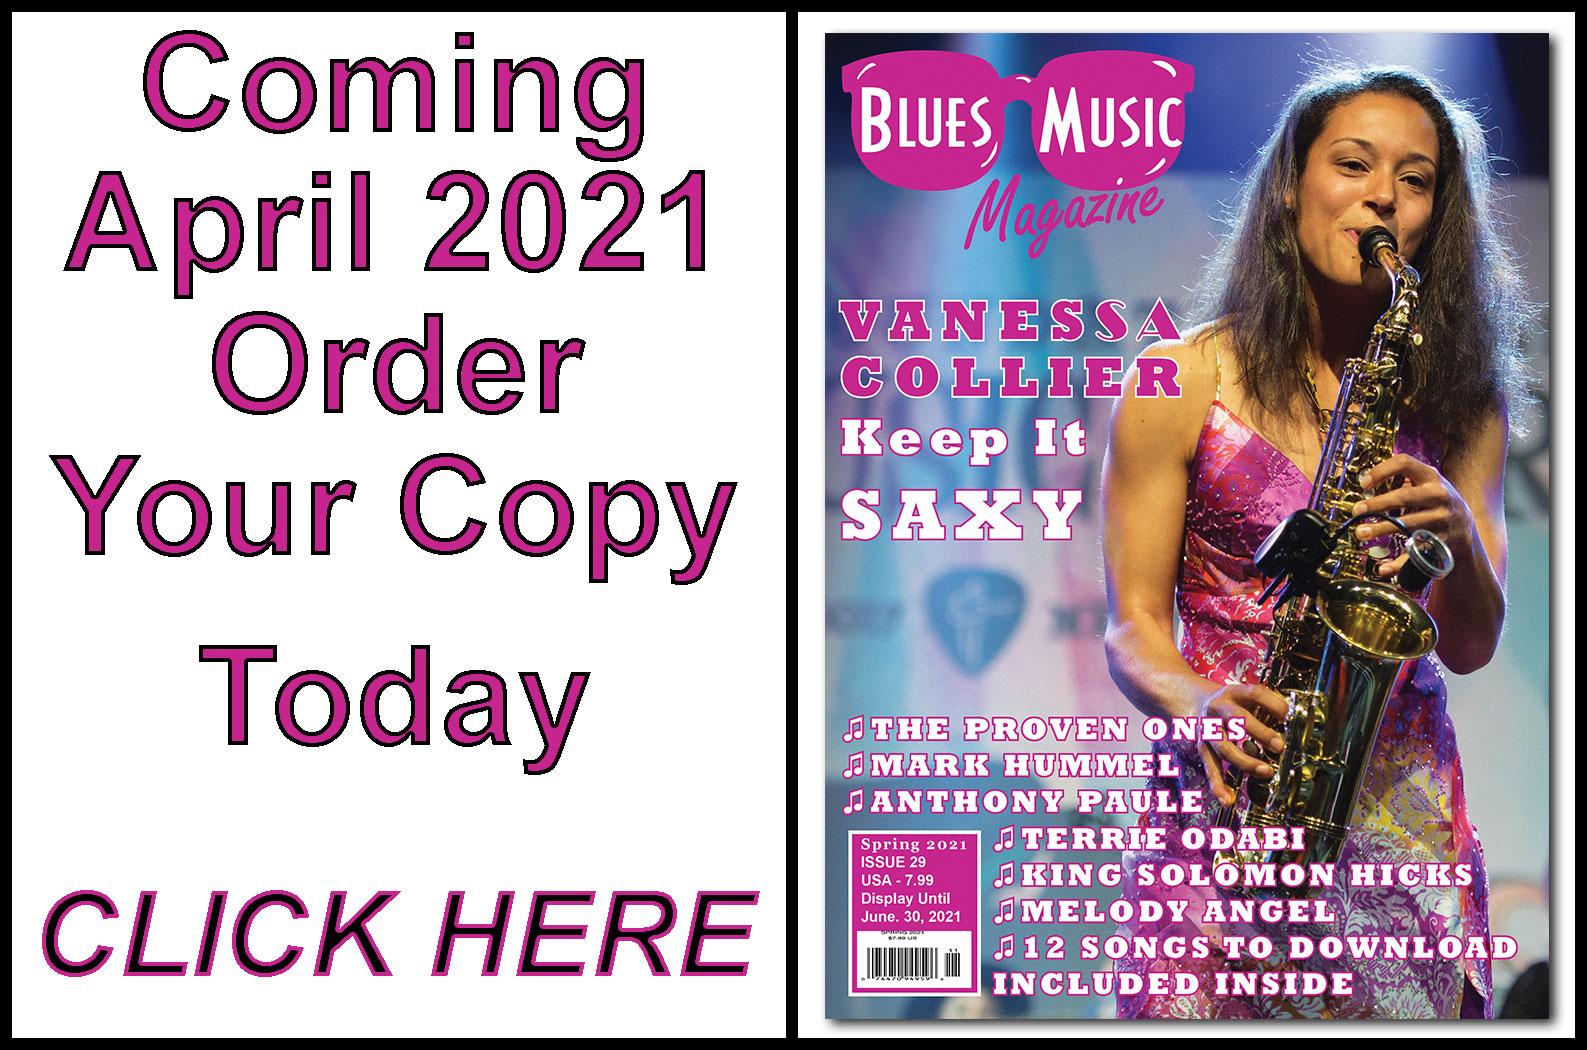 issue-29-april-2021.jpg